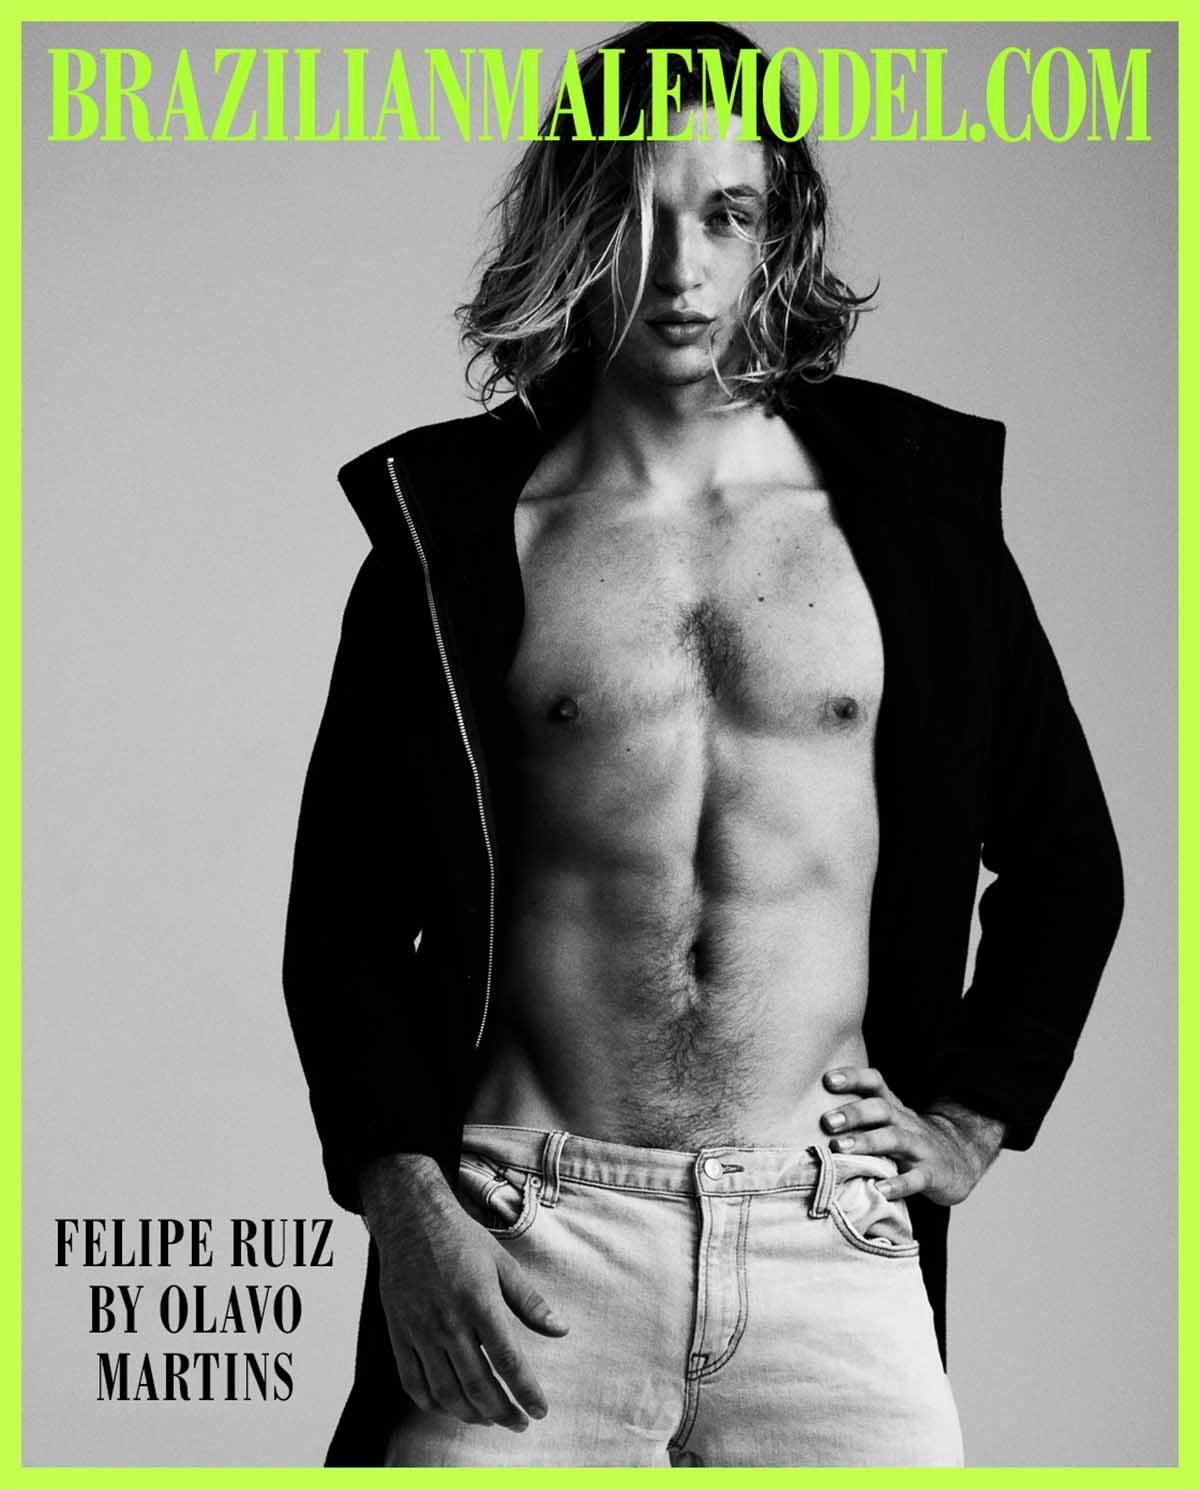 Felipe Ruiz by Olavo Martins